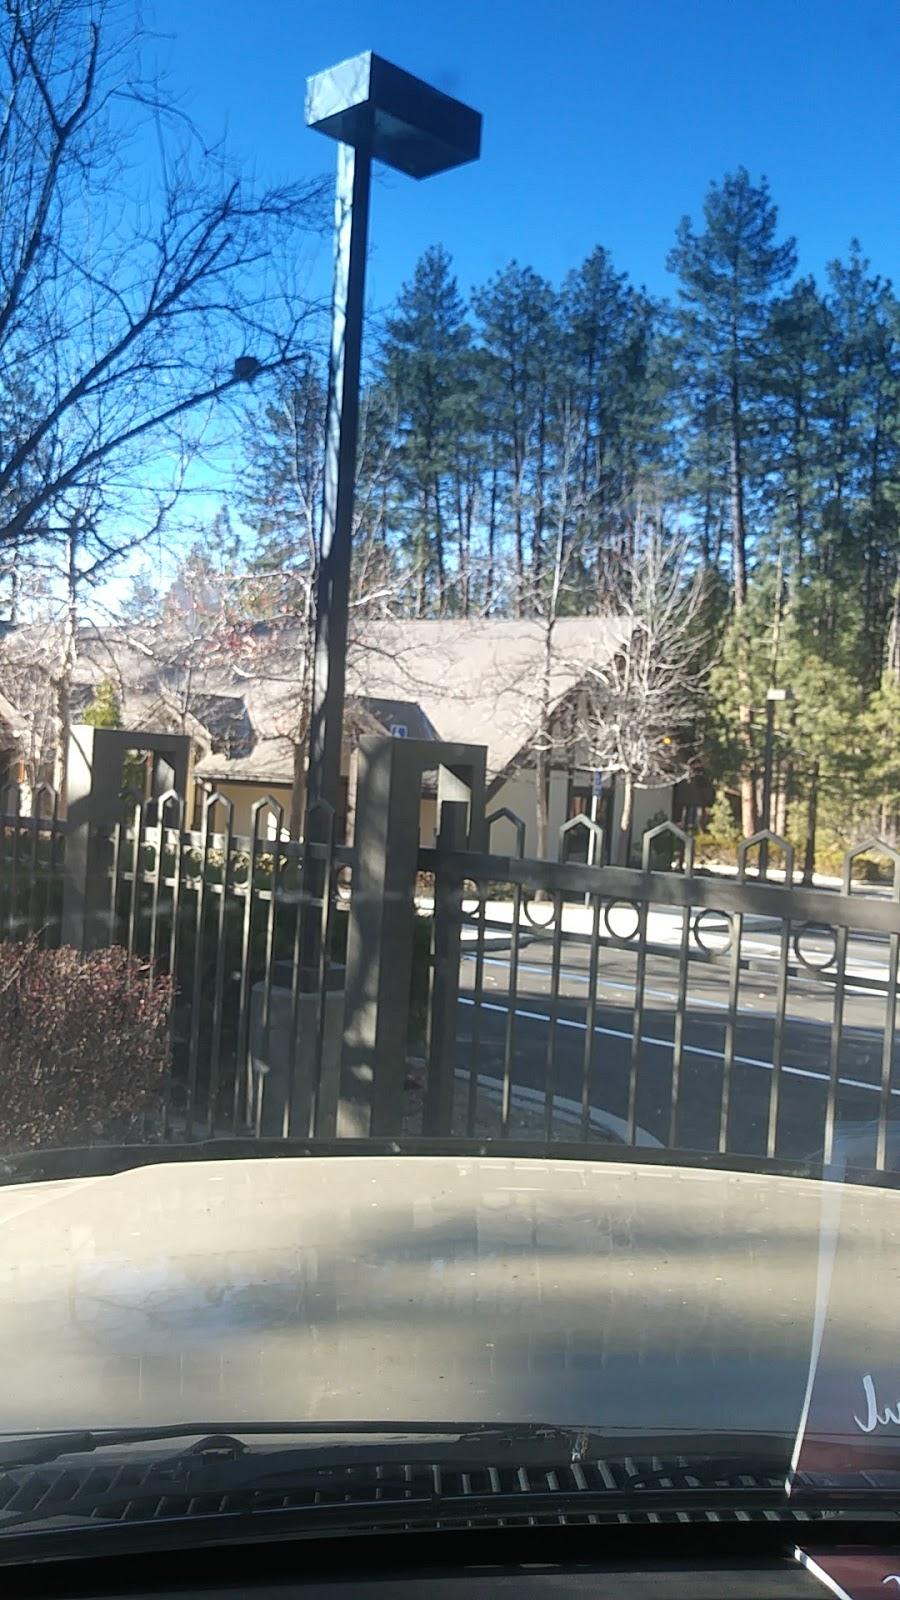 The Church of Jesus Christ of Latter-day Saints - church  | Photo 1 of 2 | Address: 53830 Tollgate Rd, Idyllwild, CA 92549, USA | Phone: (760) 344-0833